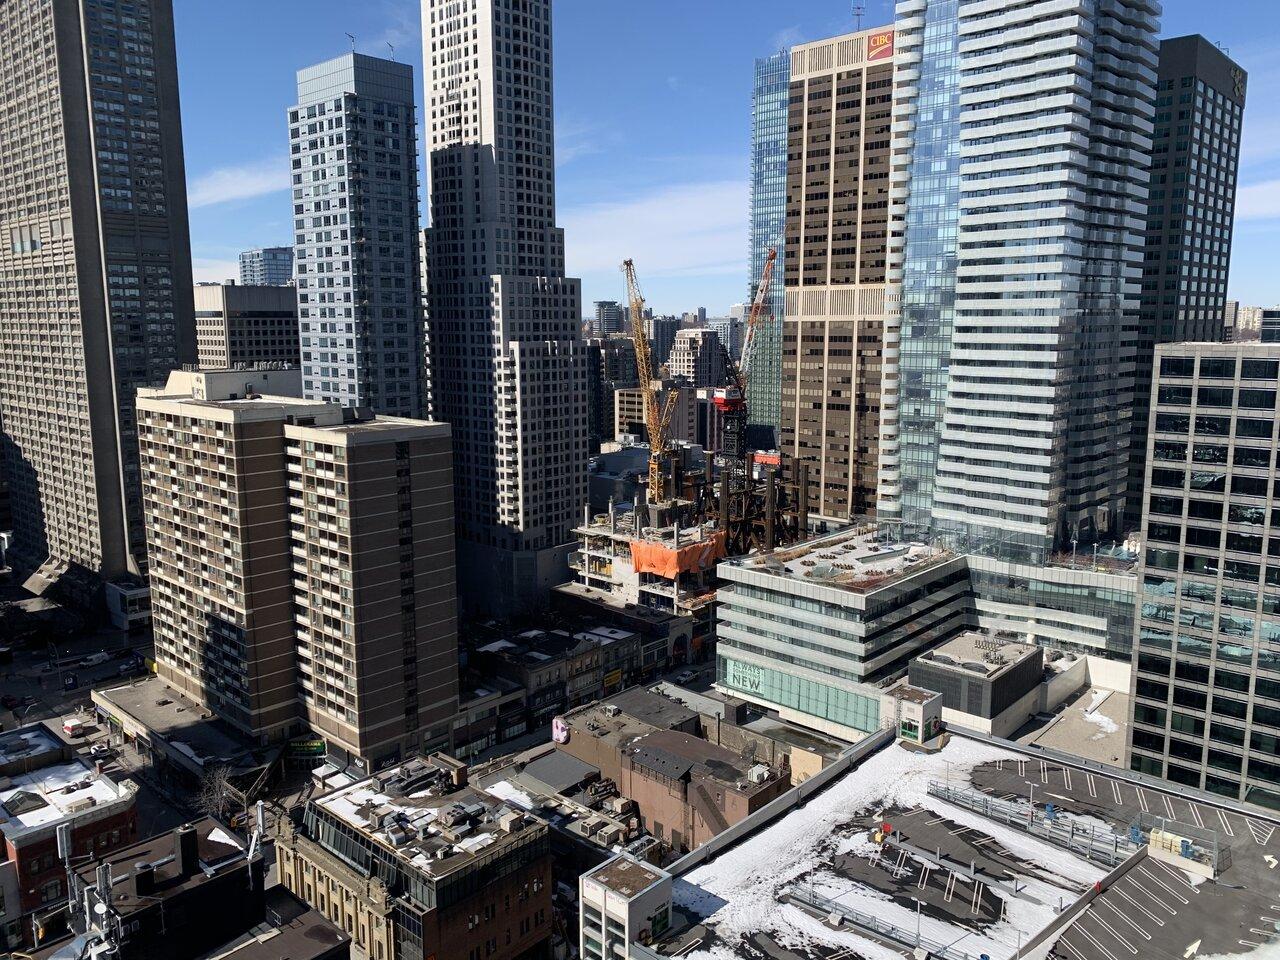 Daily Photo, Toronto, skyline, Bloor-Yorkville